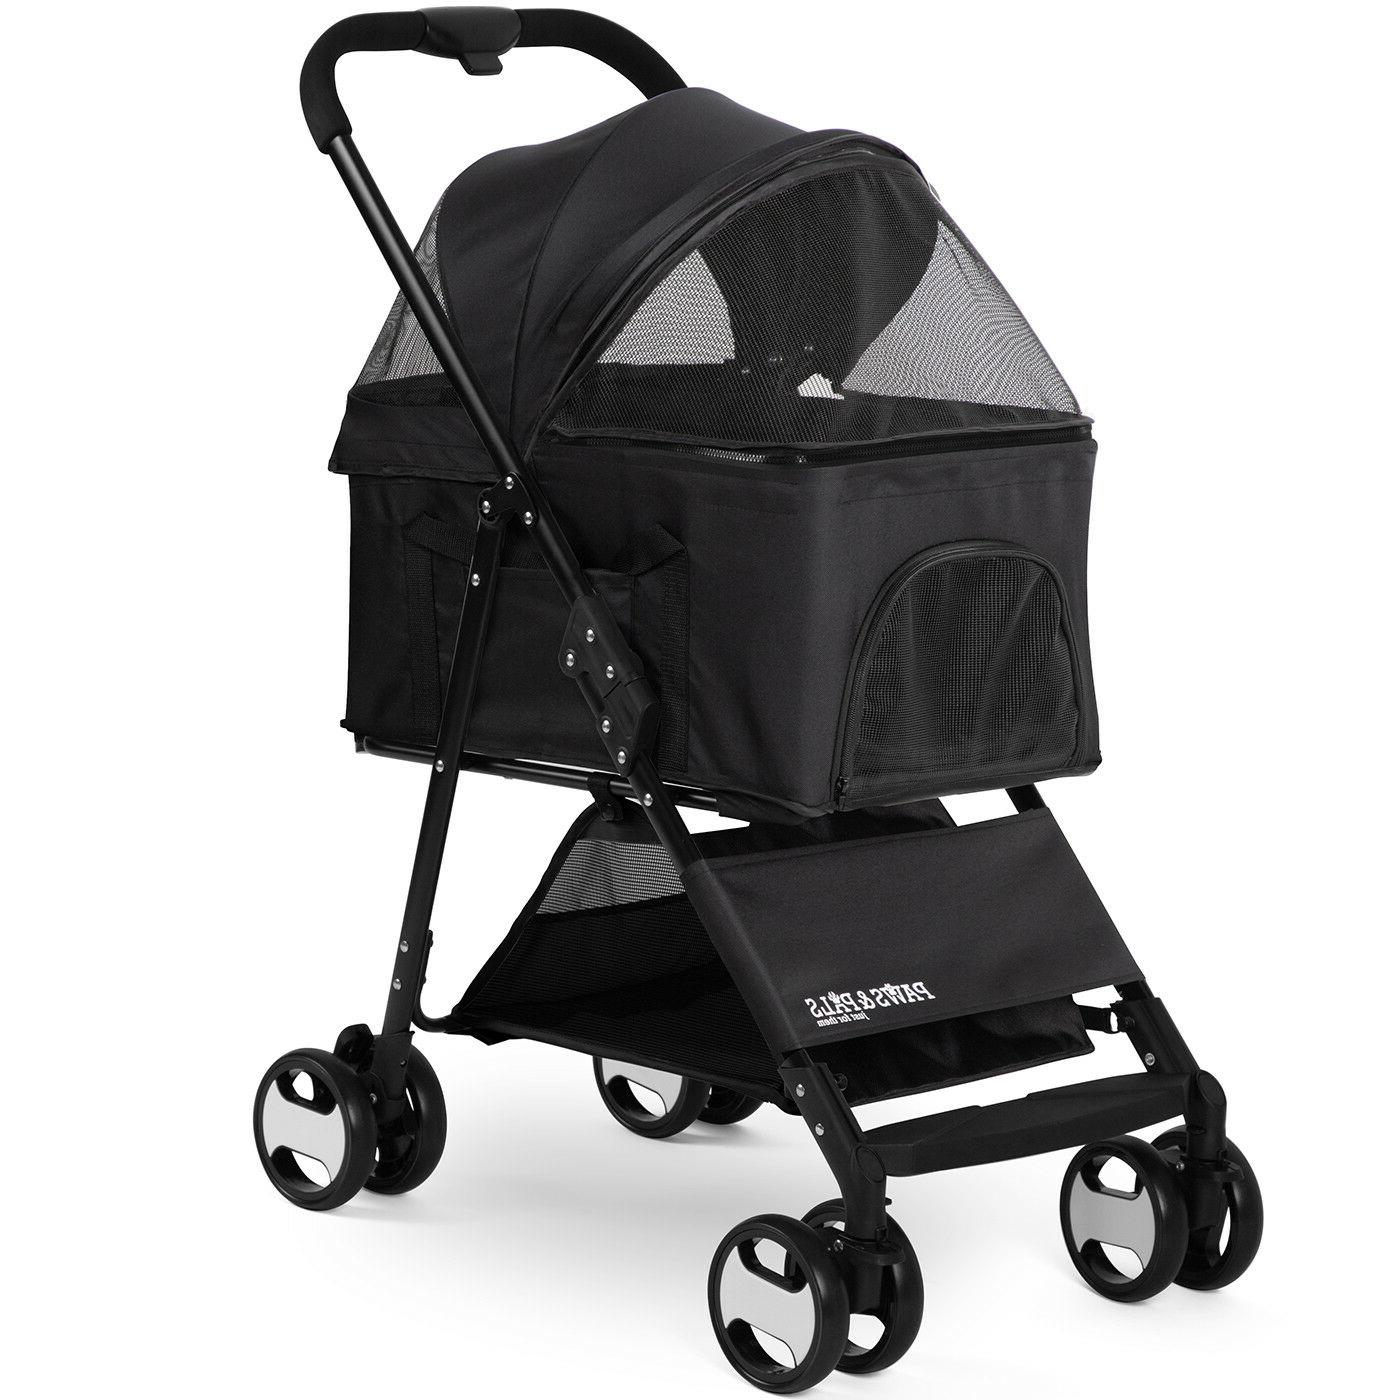 pet stroller 2 in 1 detachable carrier